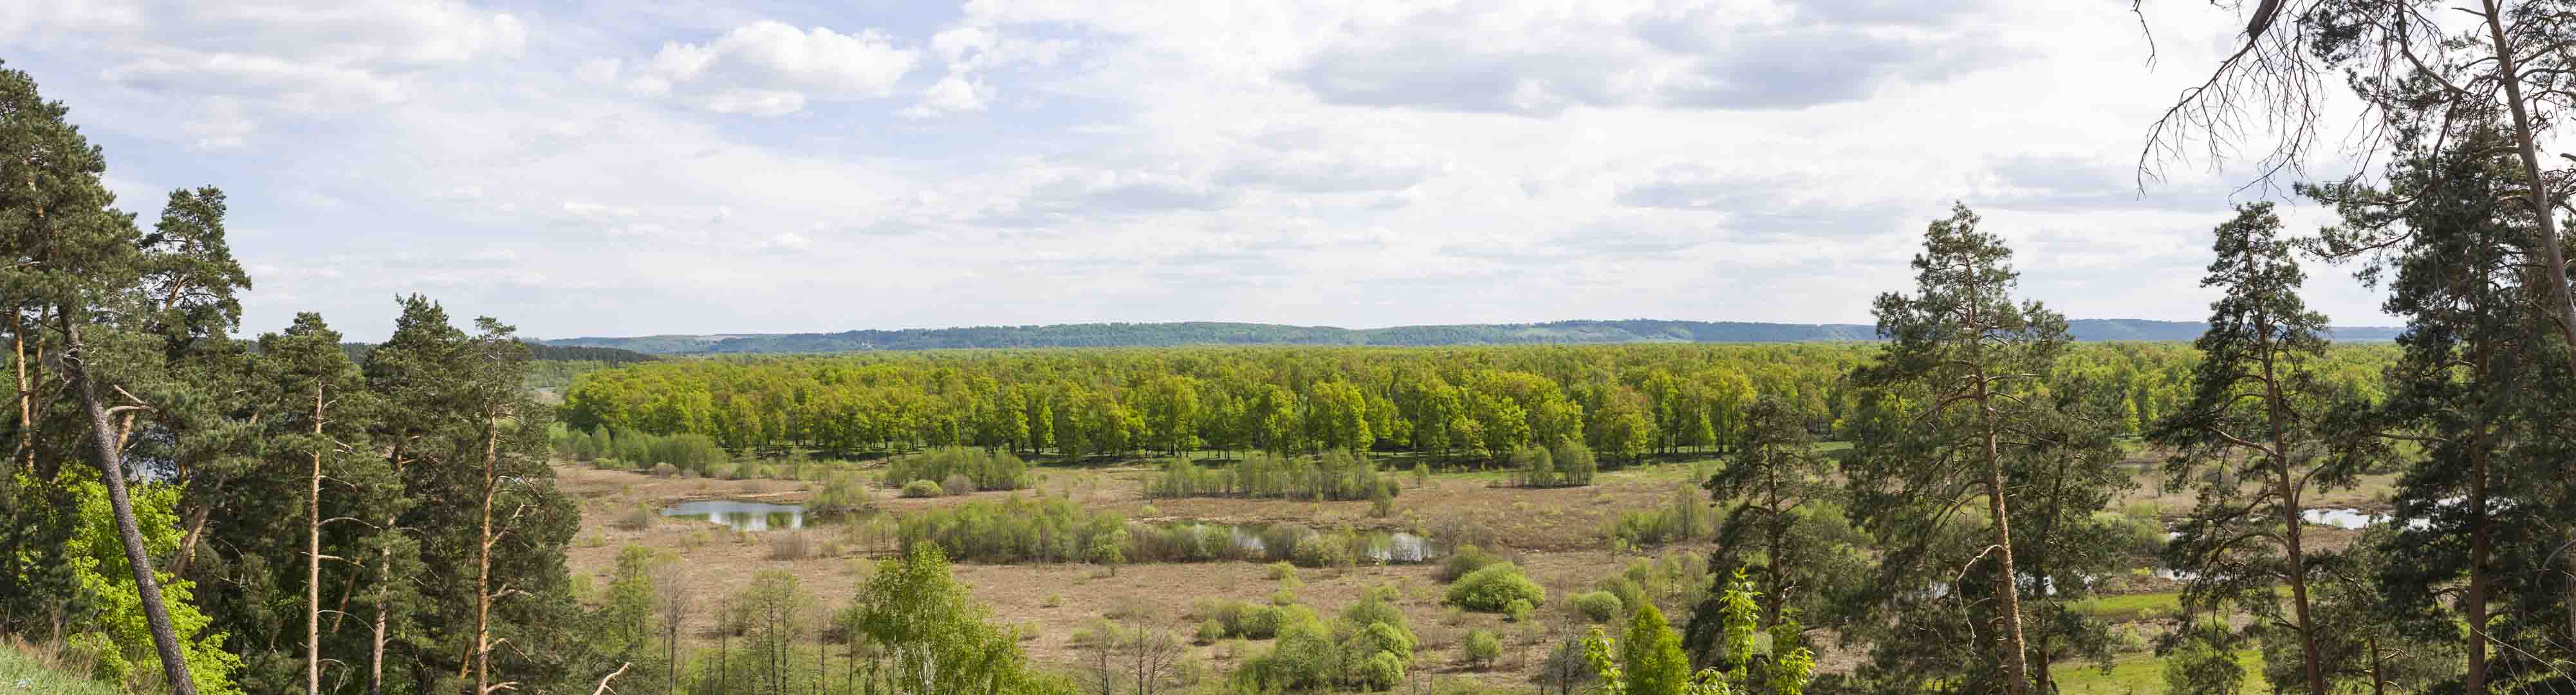 Scenic View near Oka River in Dzerzhinsk, Nizhegorodskaya Oblast – Russia